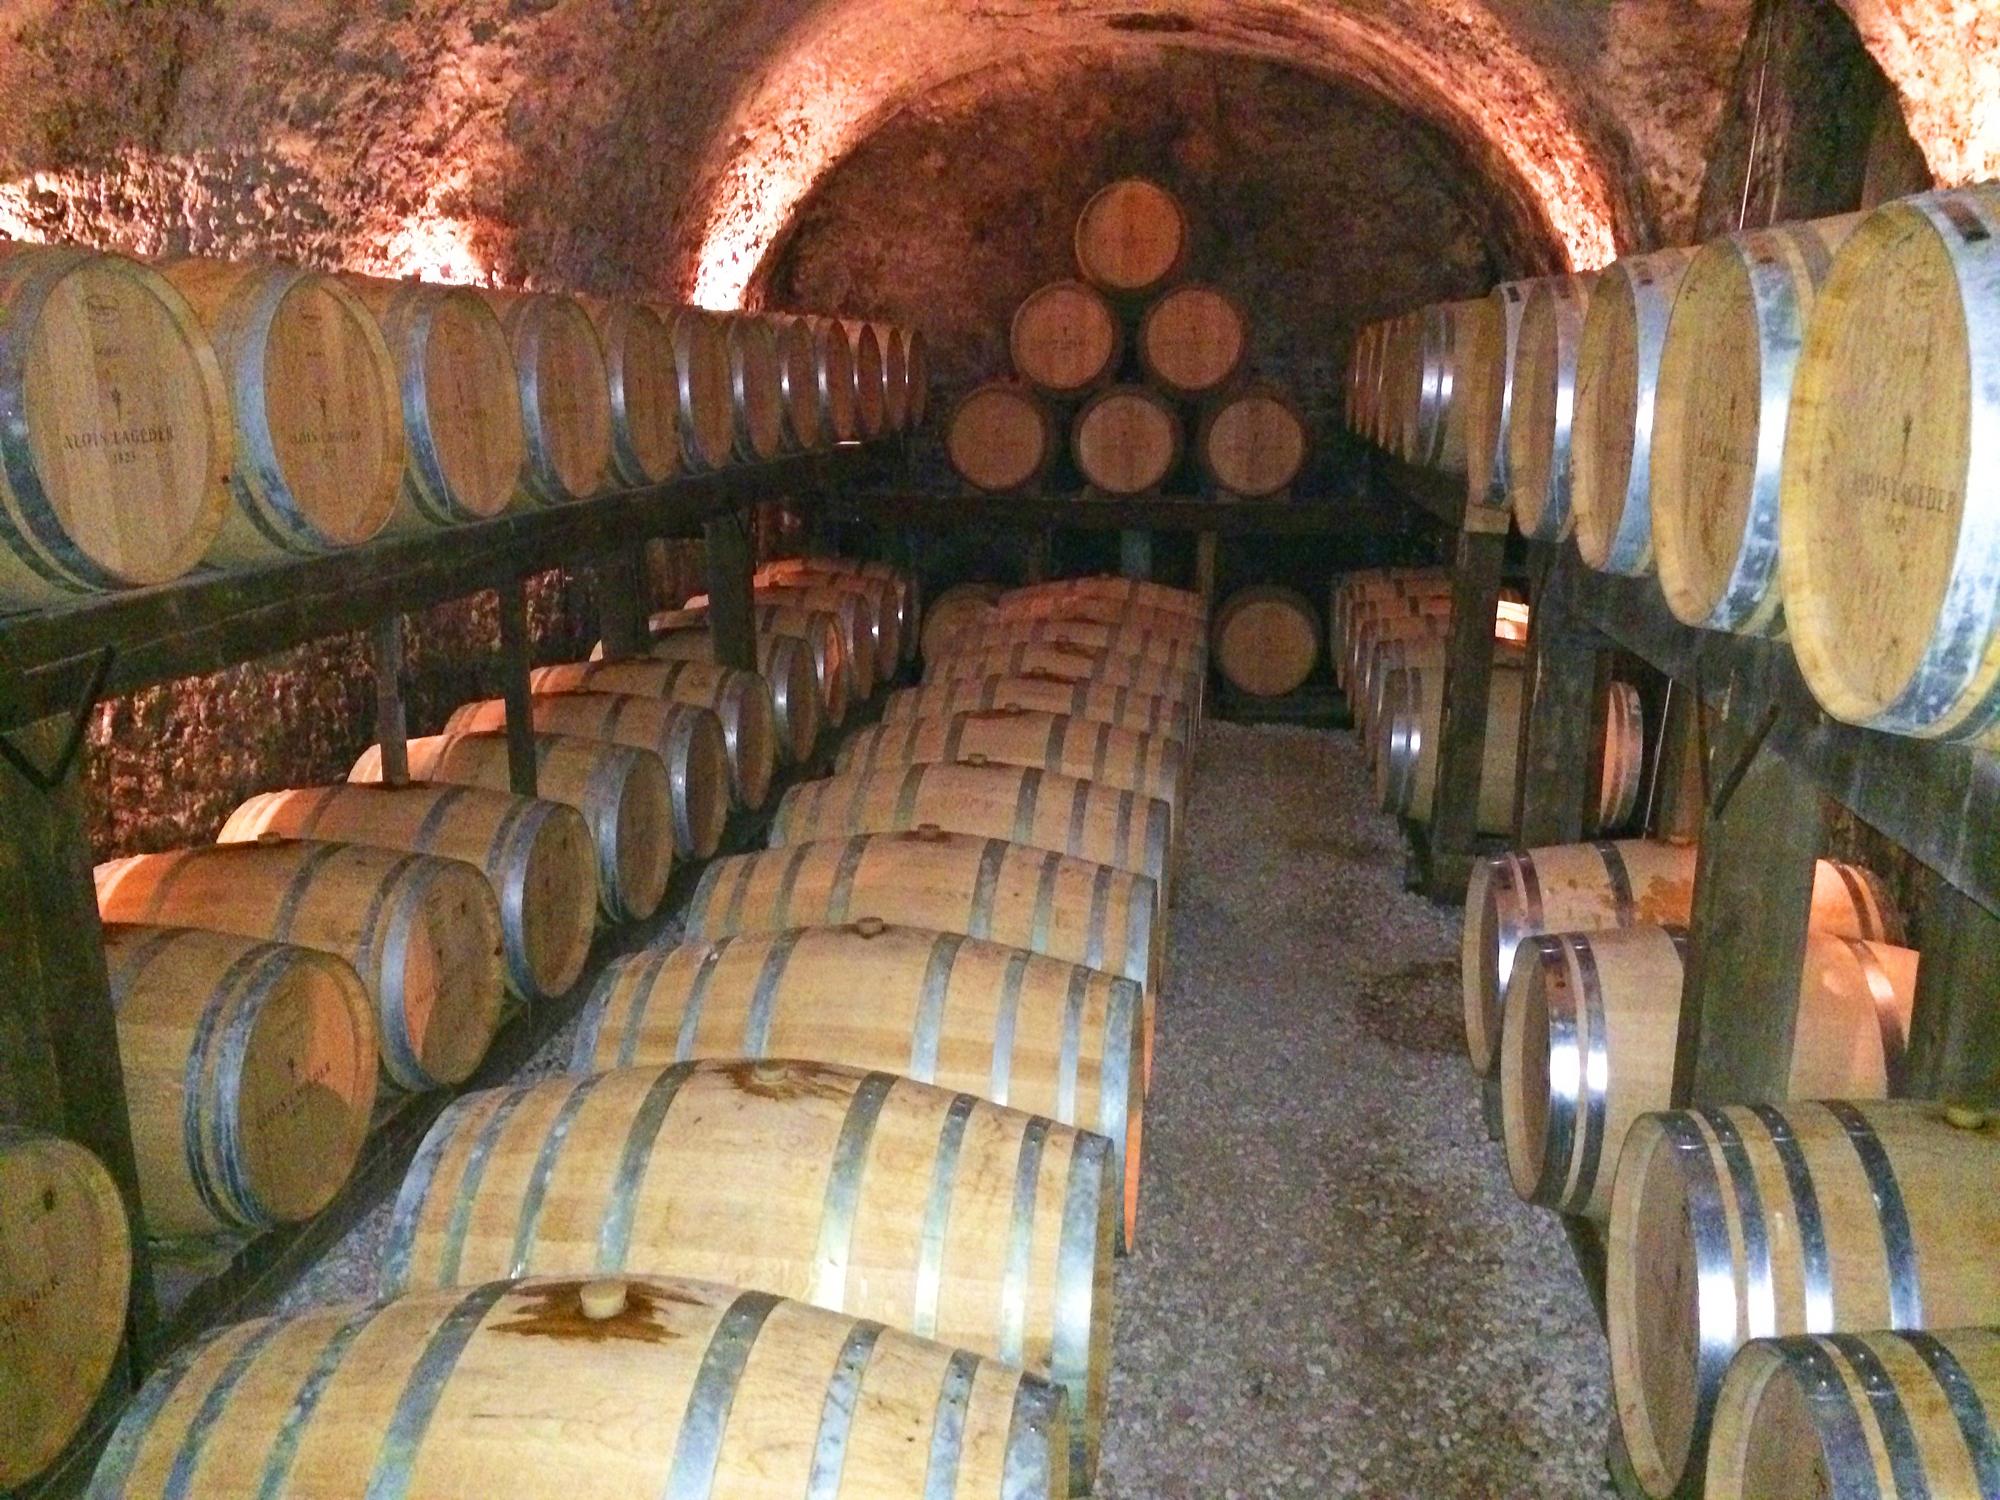 072314 FD wine yeast art & Bonded wine | Wine Openers